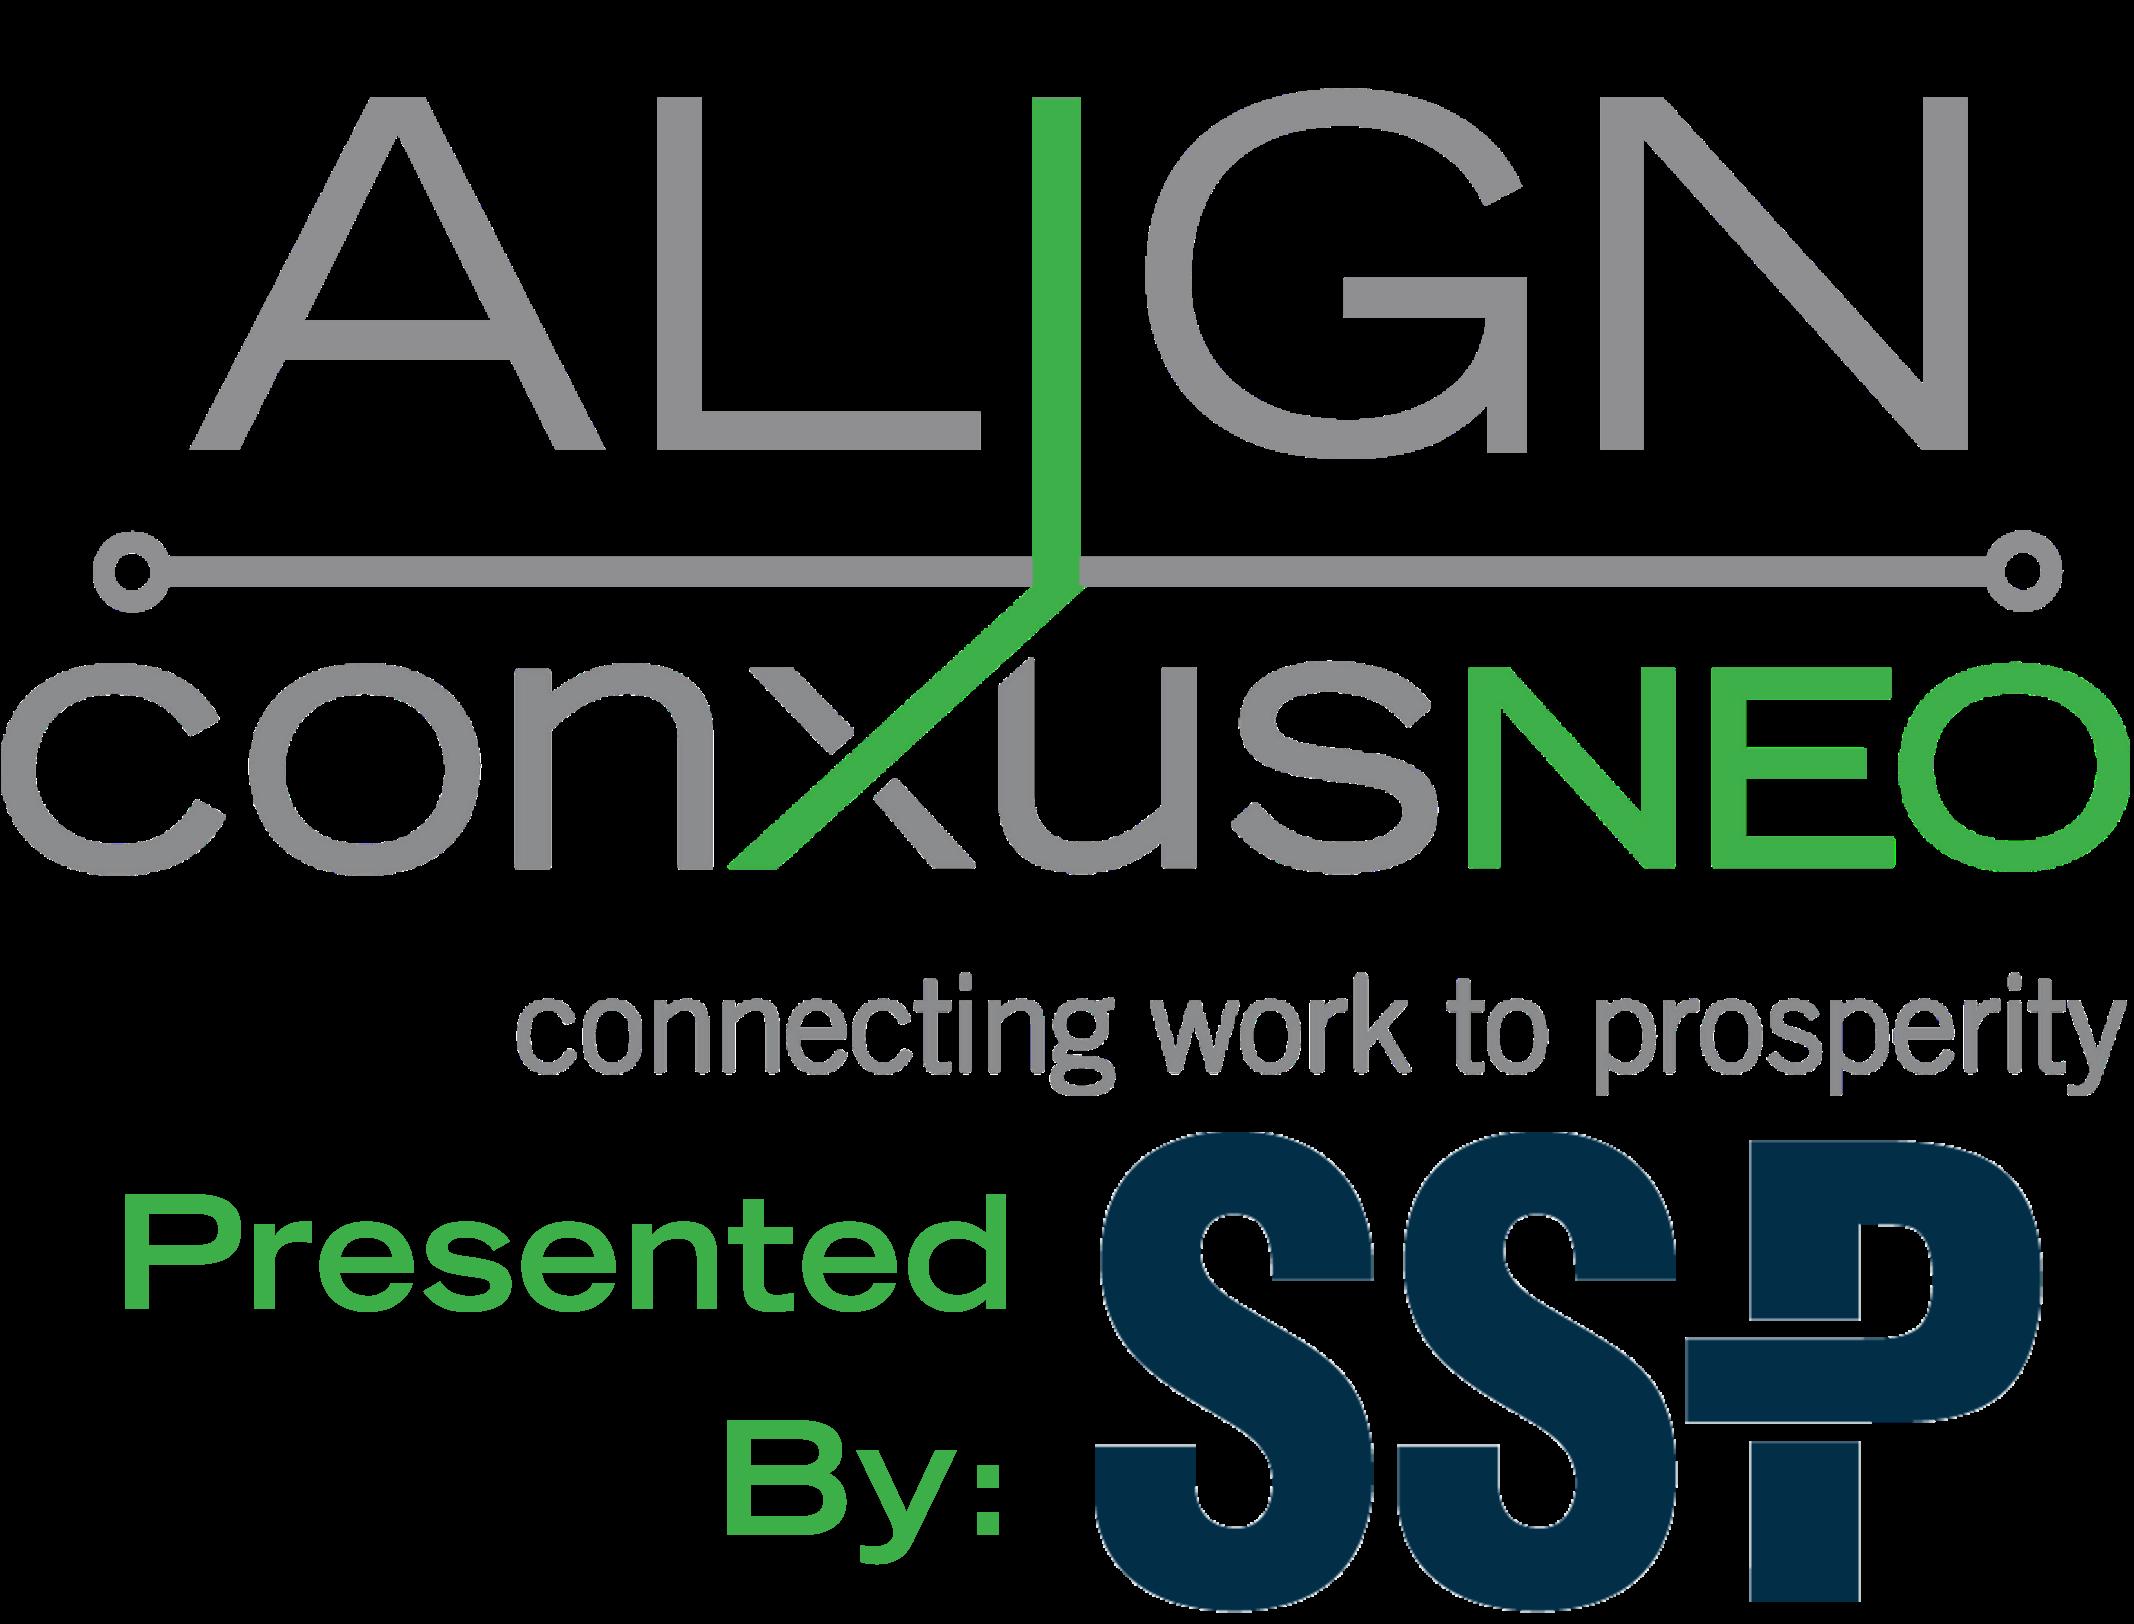 ALIGN presented SSP